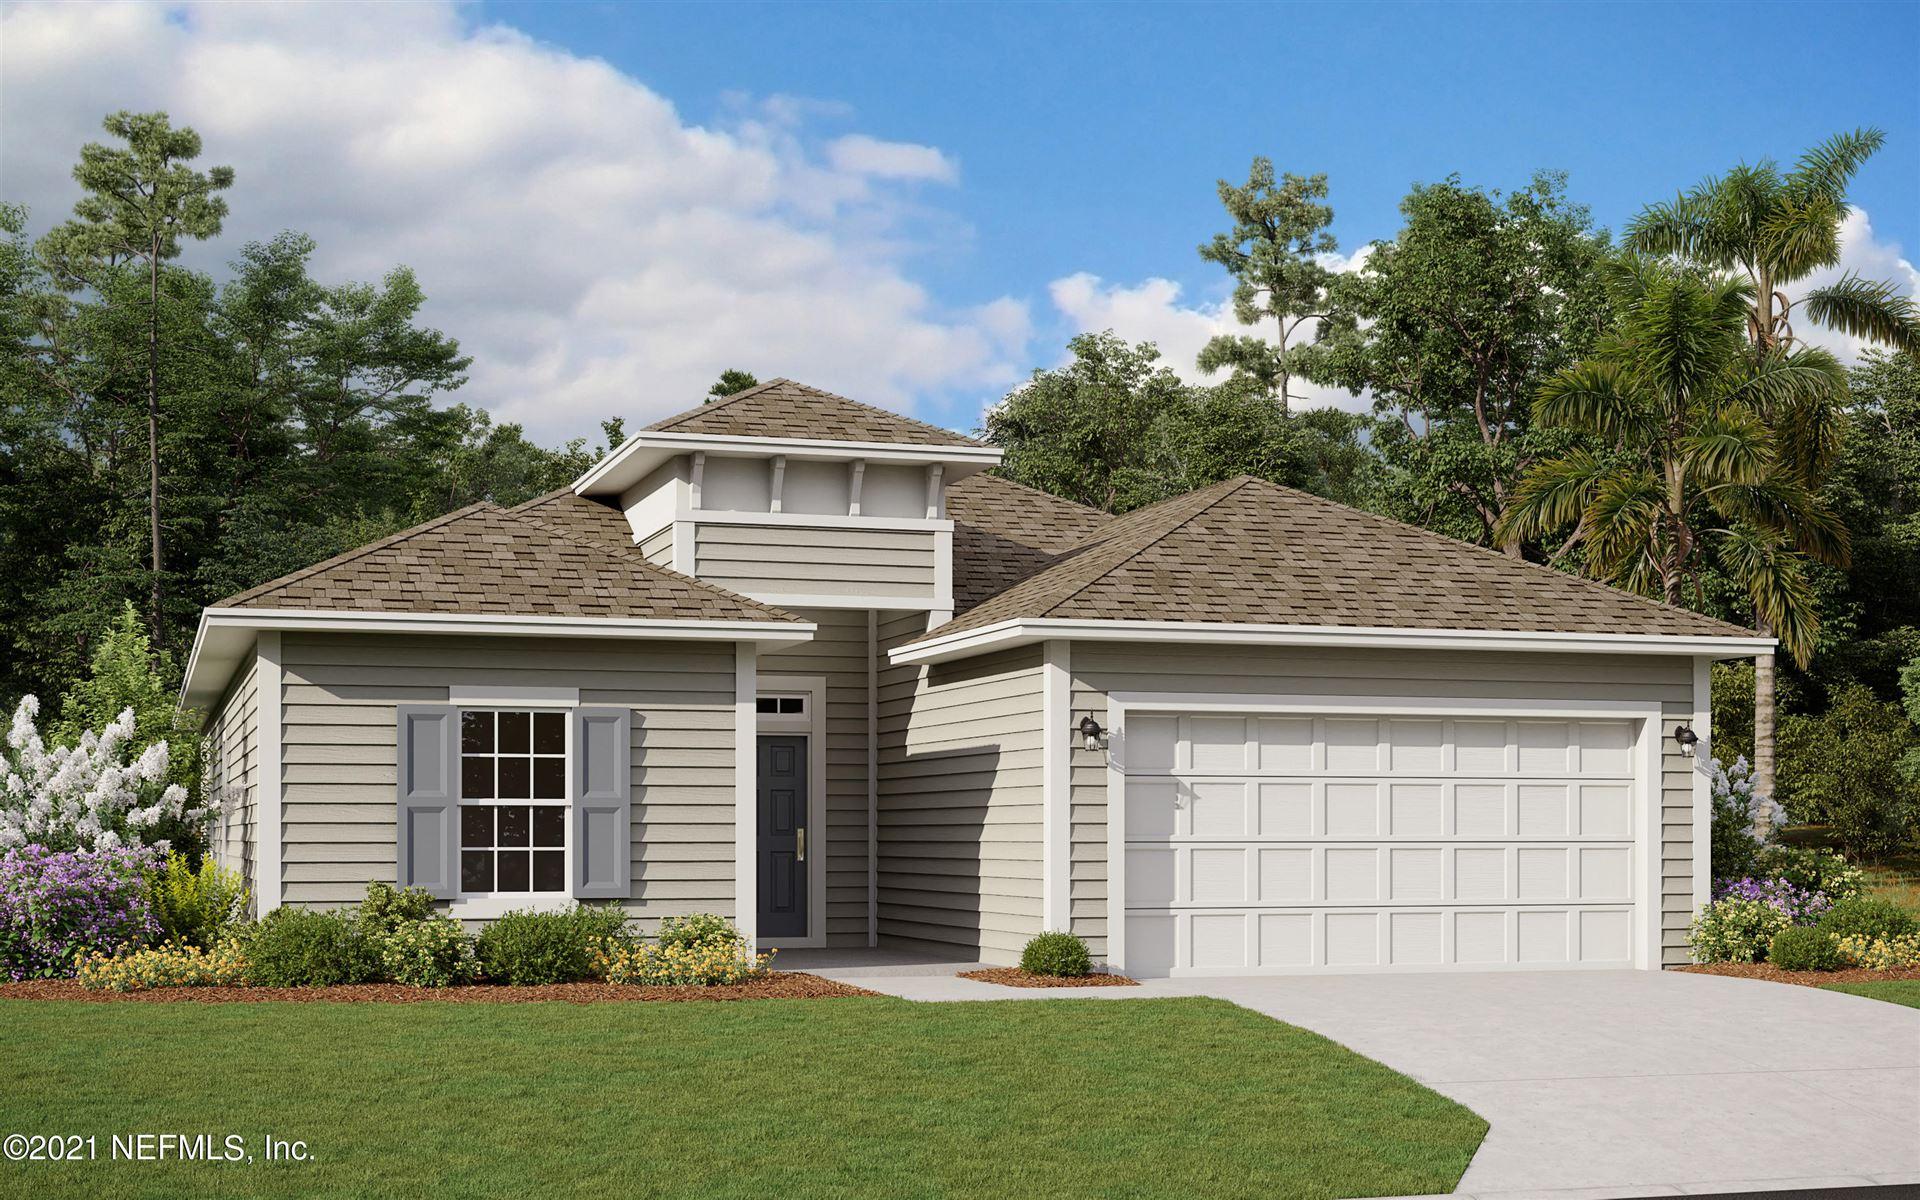 2877 COPPERWOOD AVE #Lot No: 061, Orange Park, FL 32073 - MLS#: 1097563